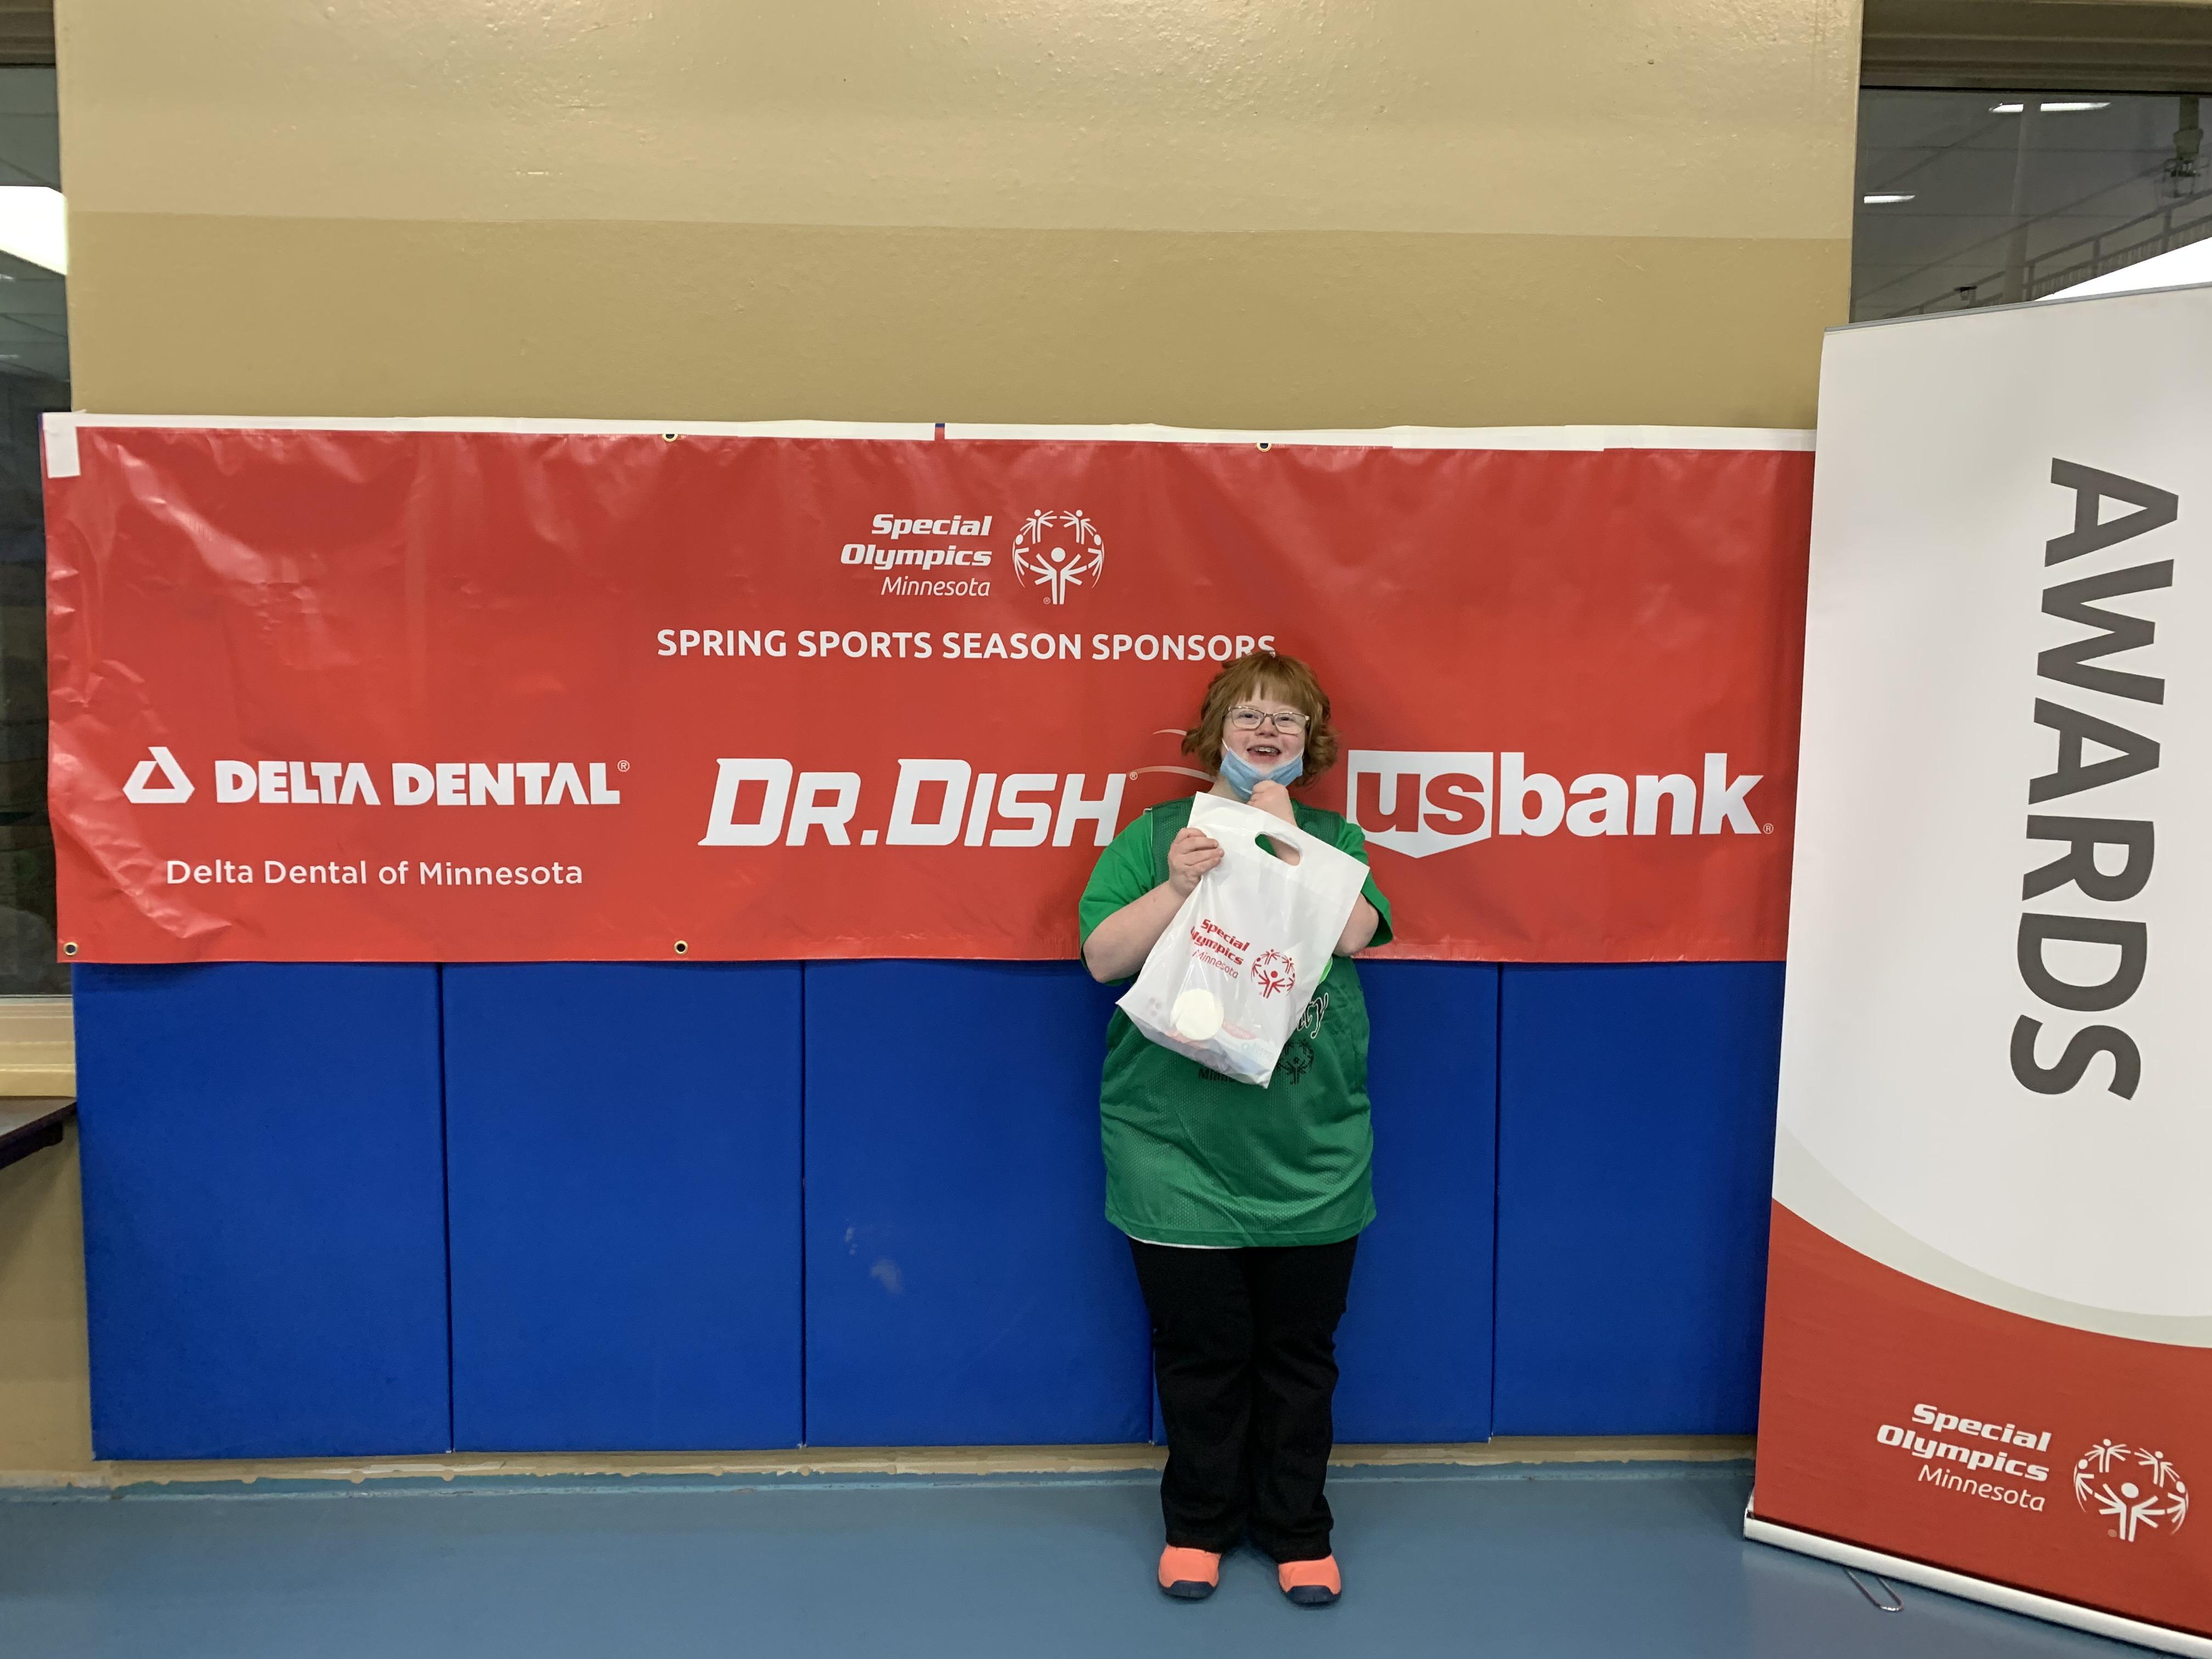 Dr. Dish Sponsors Special Olympics Minnesota Spring Sports Season